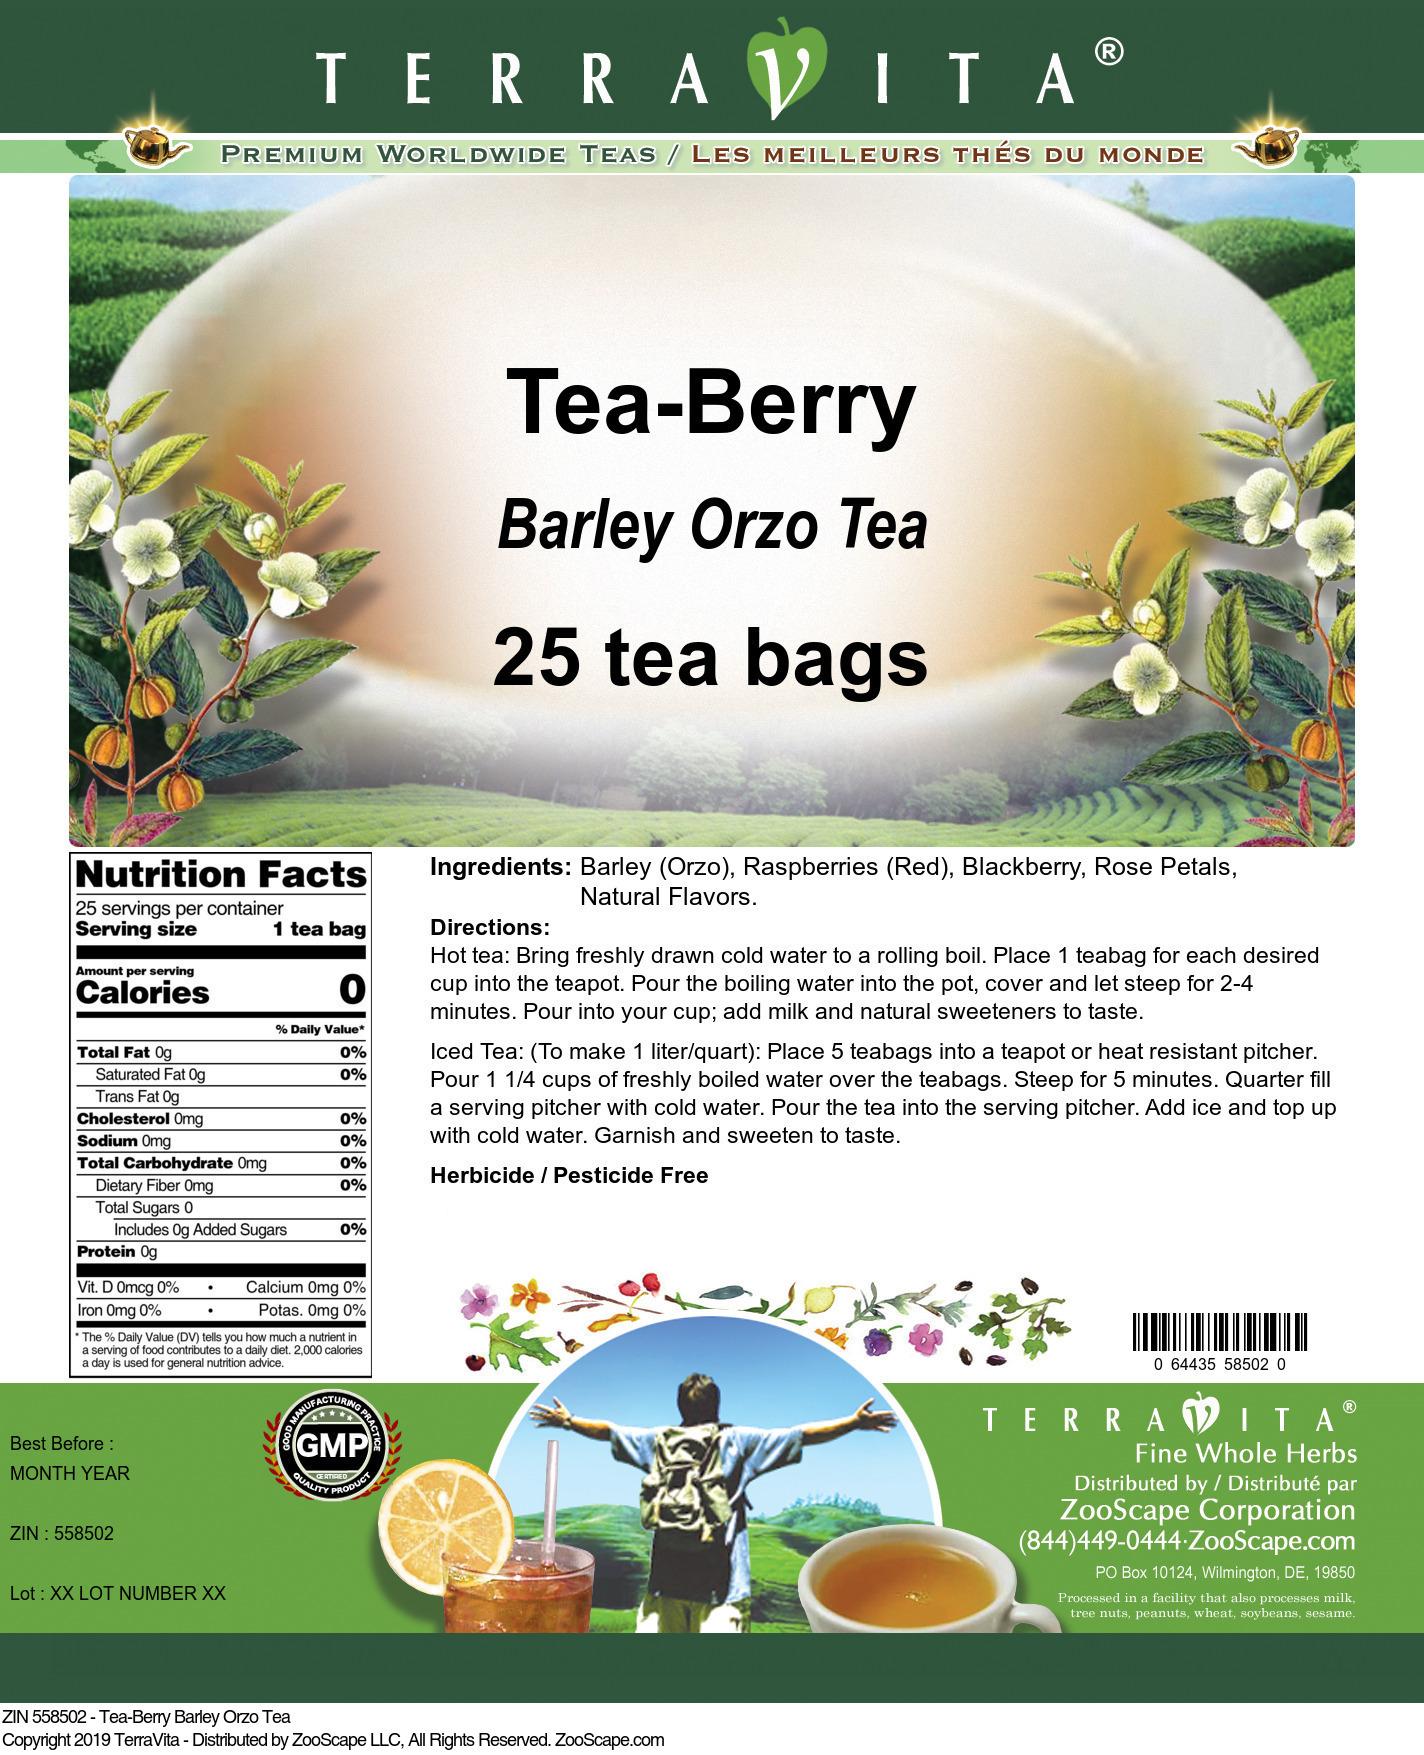 Tea-Berry Barley Orzo Tea